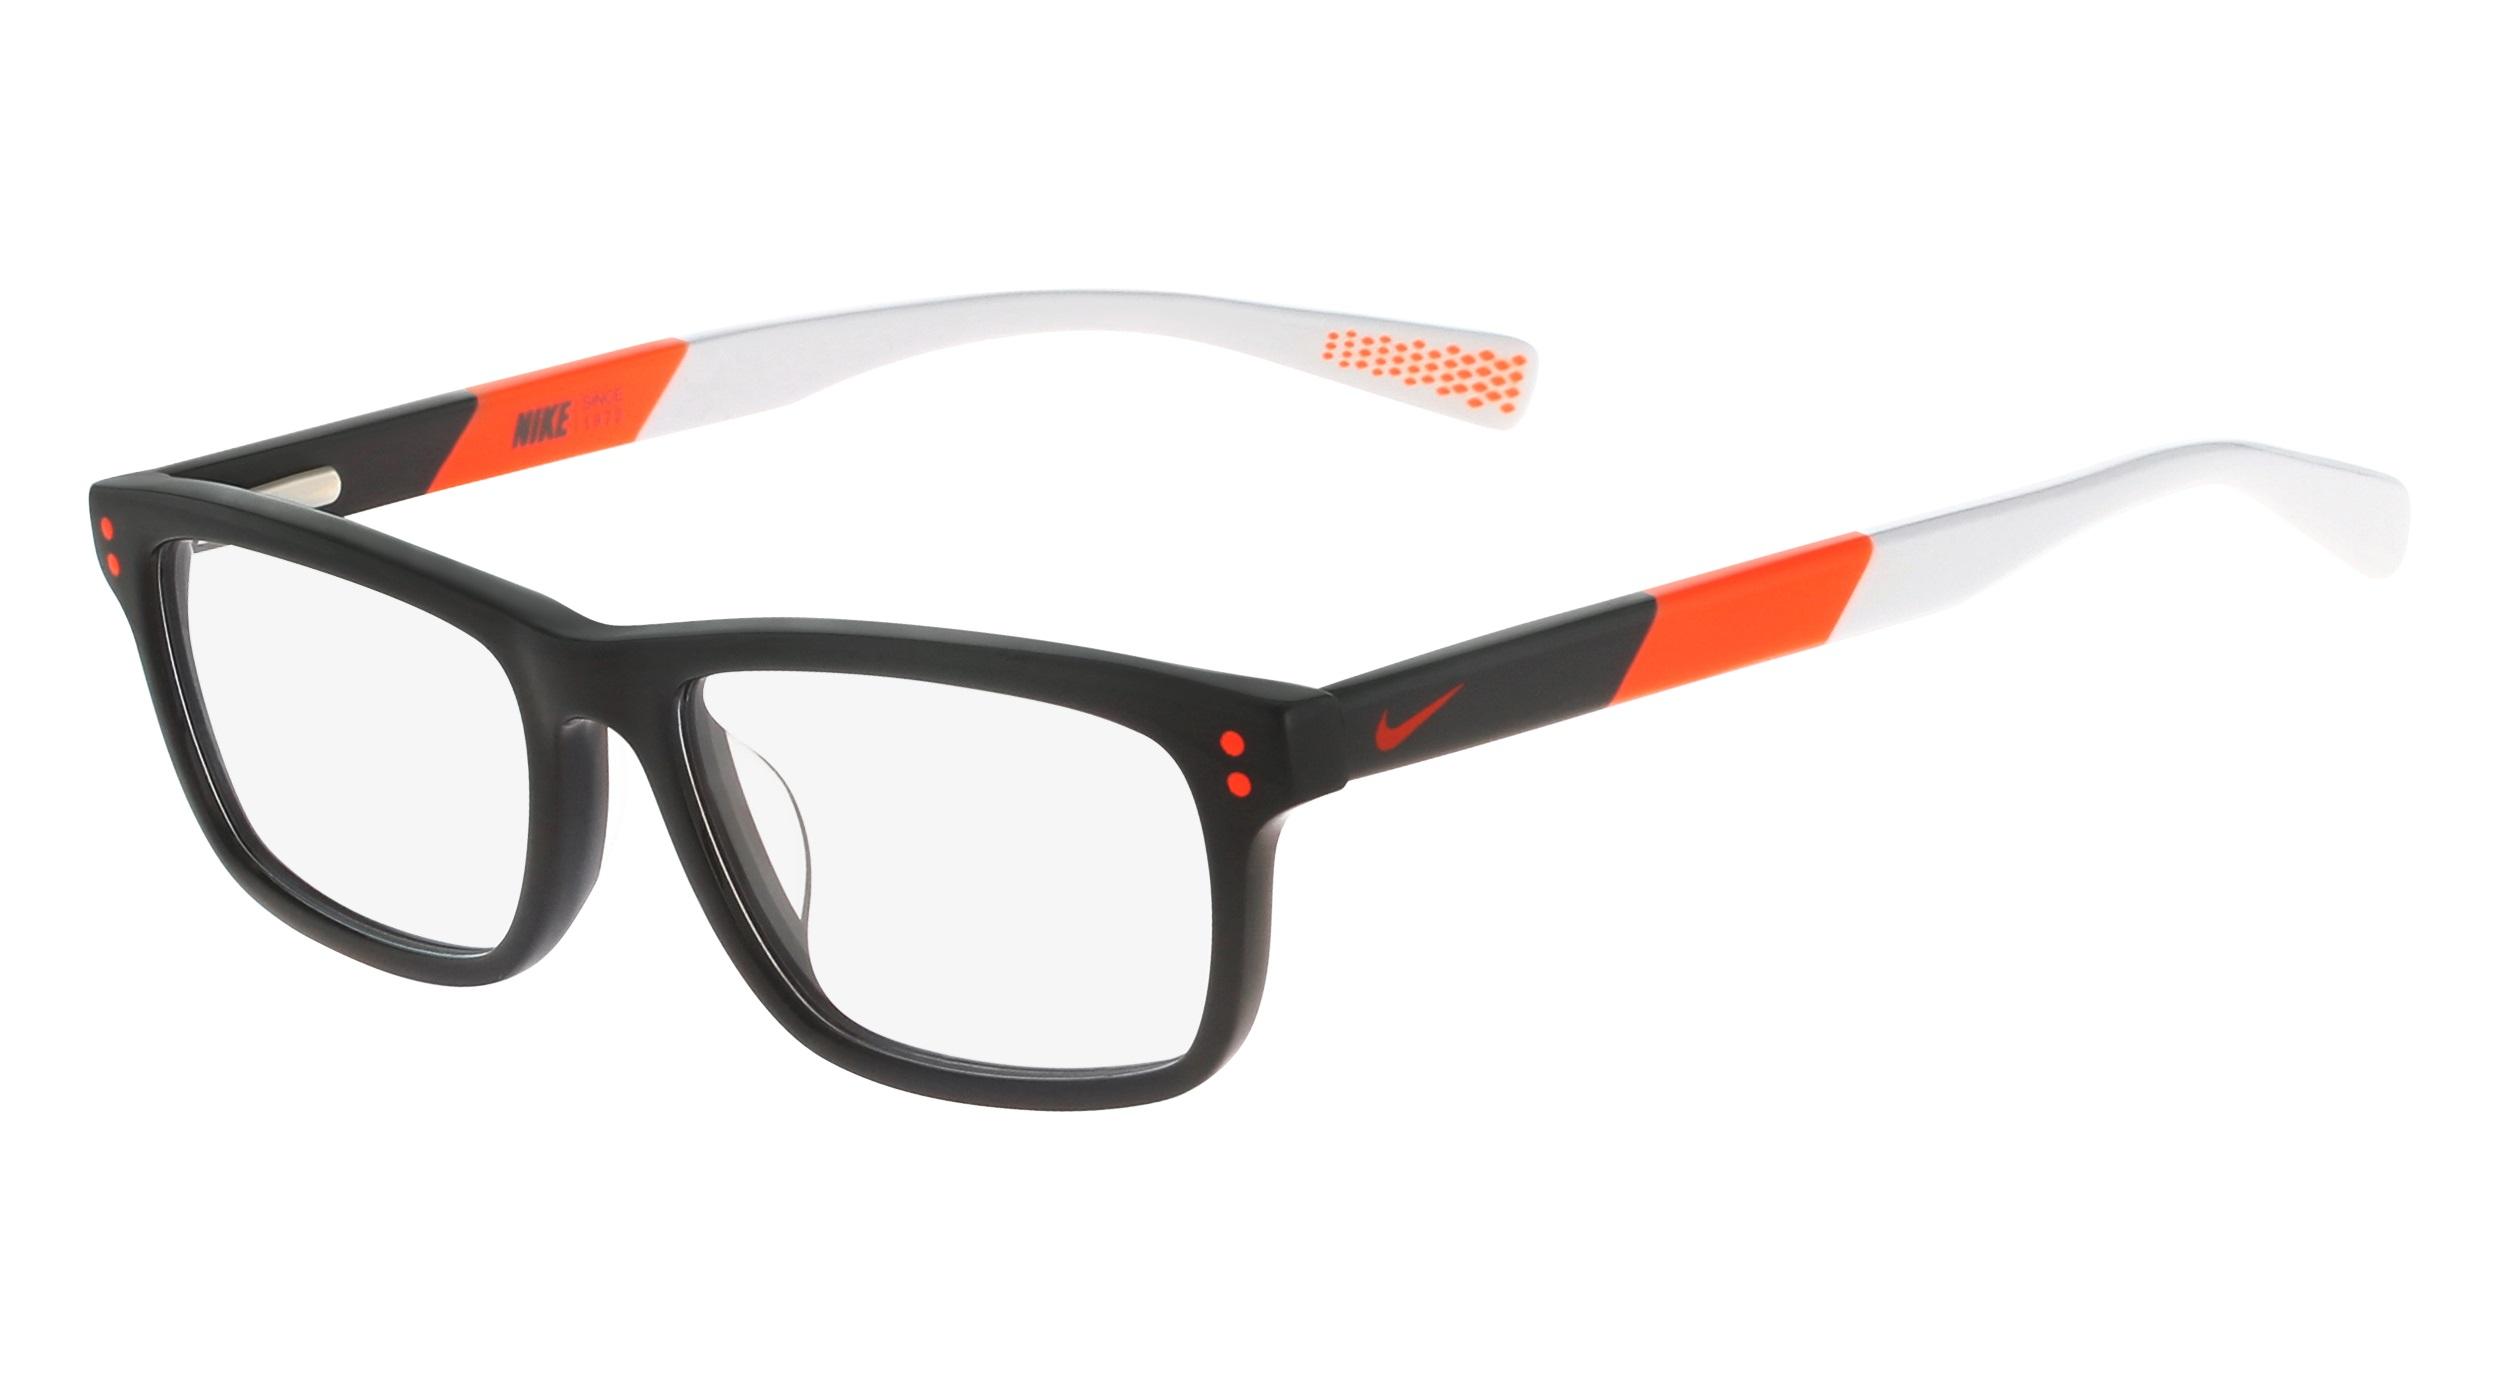 405fecaf2f4d8 Eyewear for Kids - White 6-8 years - Optiwow